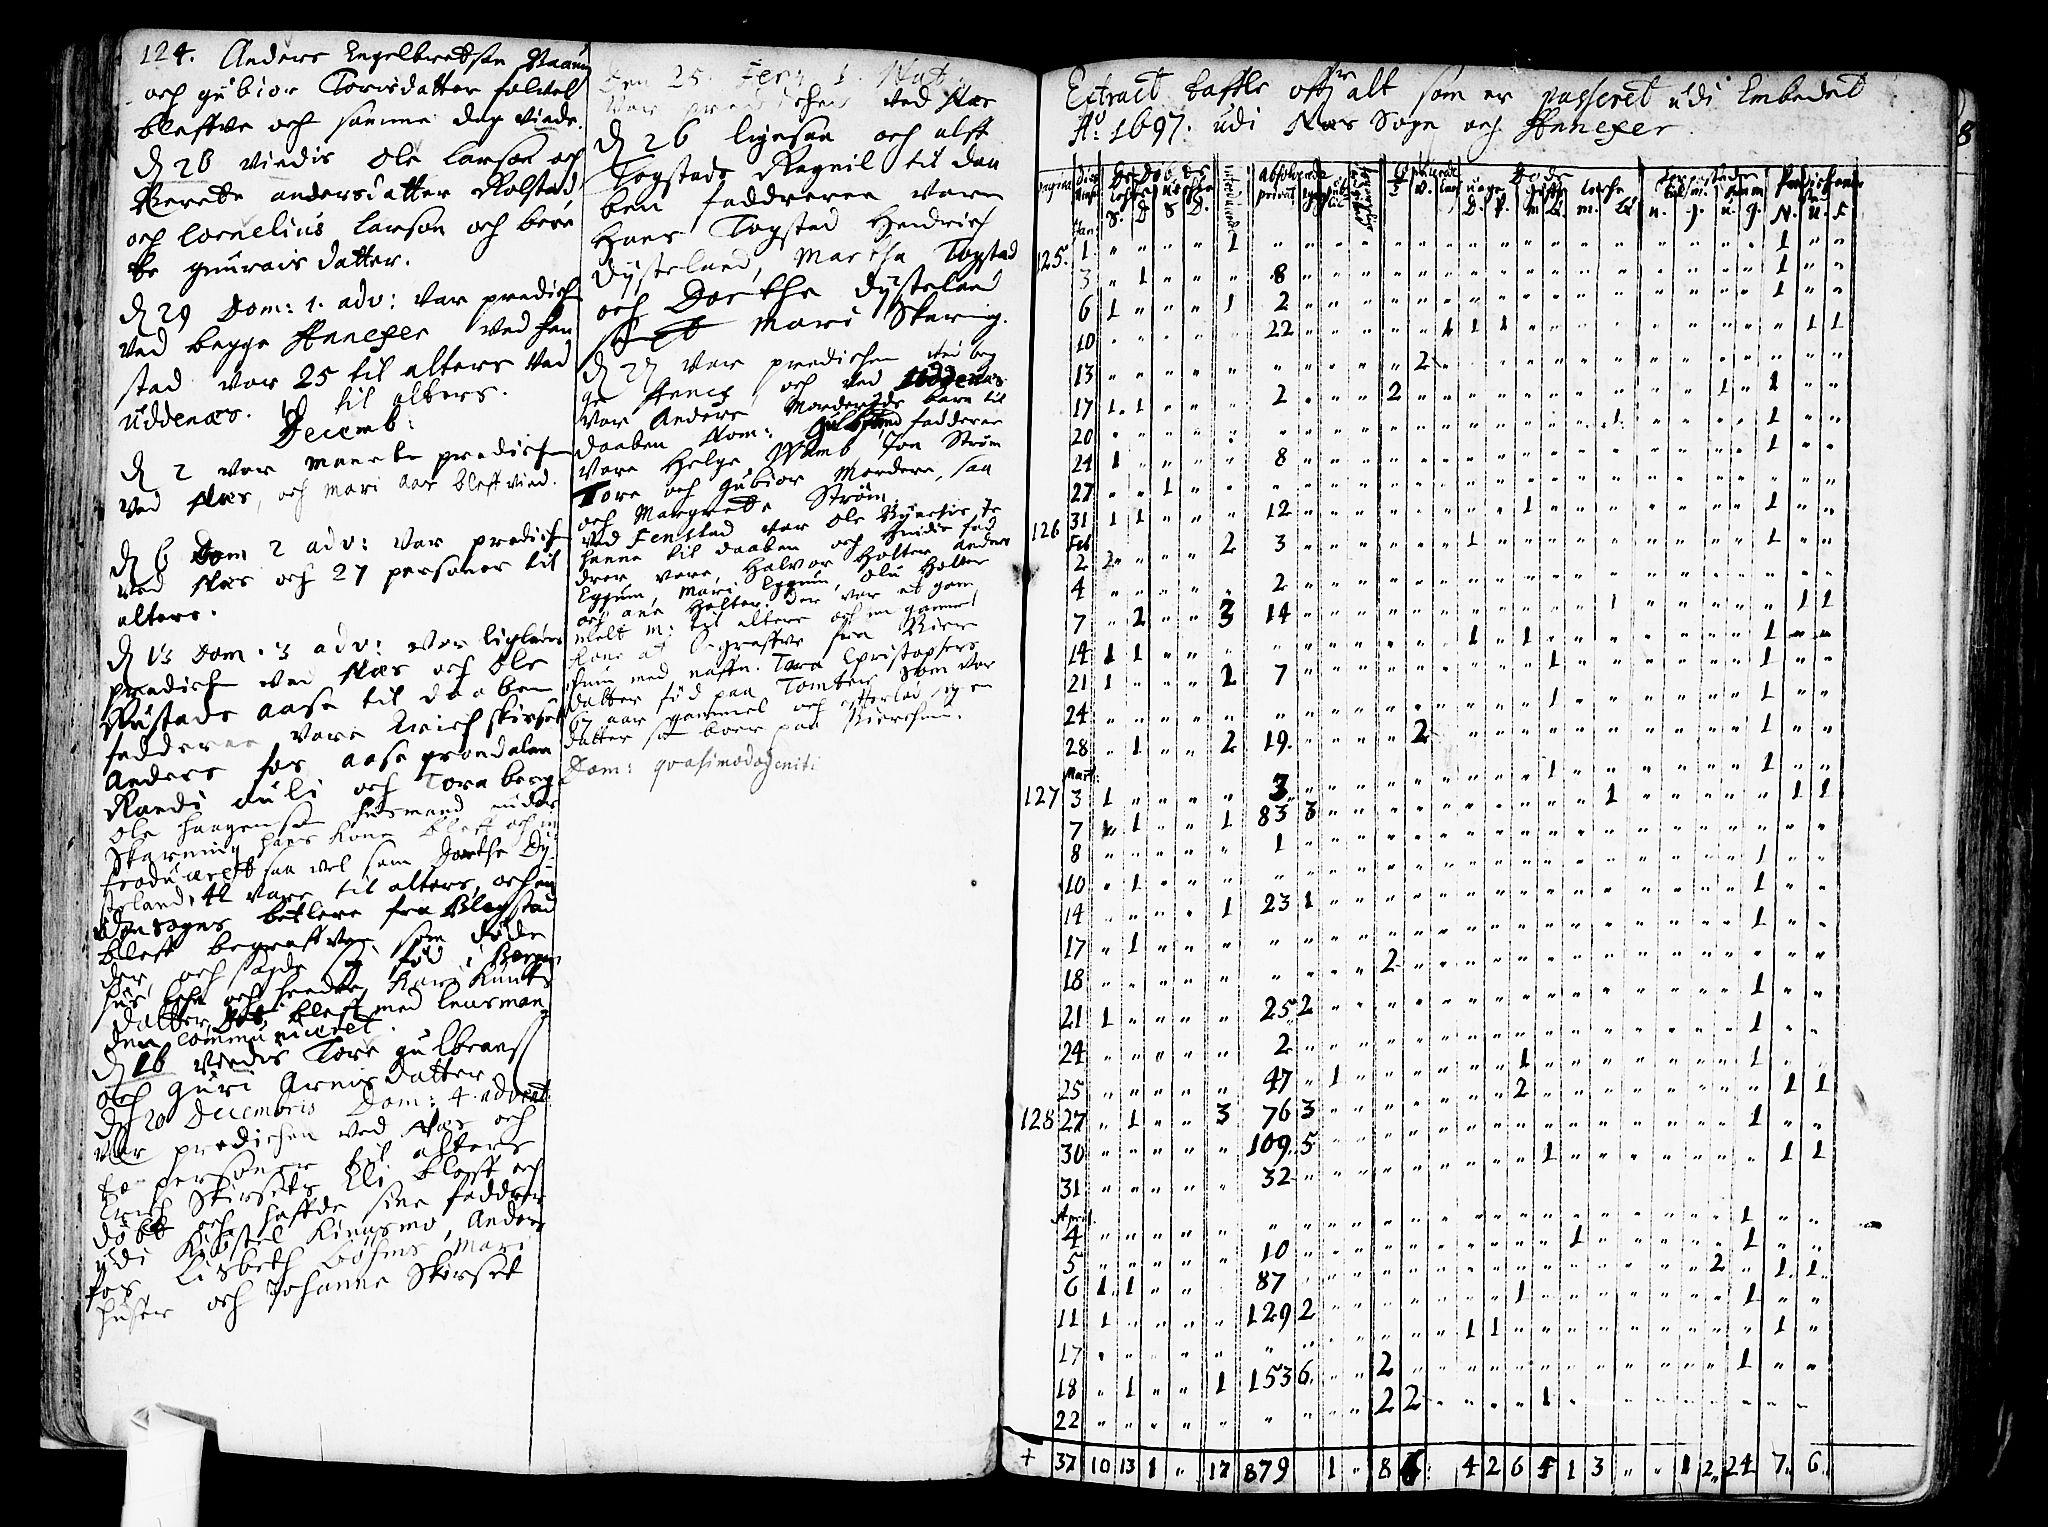 SAO, Nes prestekontor Kirkebøker, F/Fa/L0001: Parish register (official) no. I 1, 1689-1716, p. 124a-124b